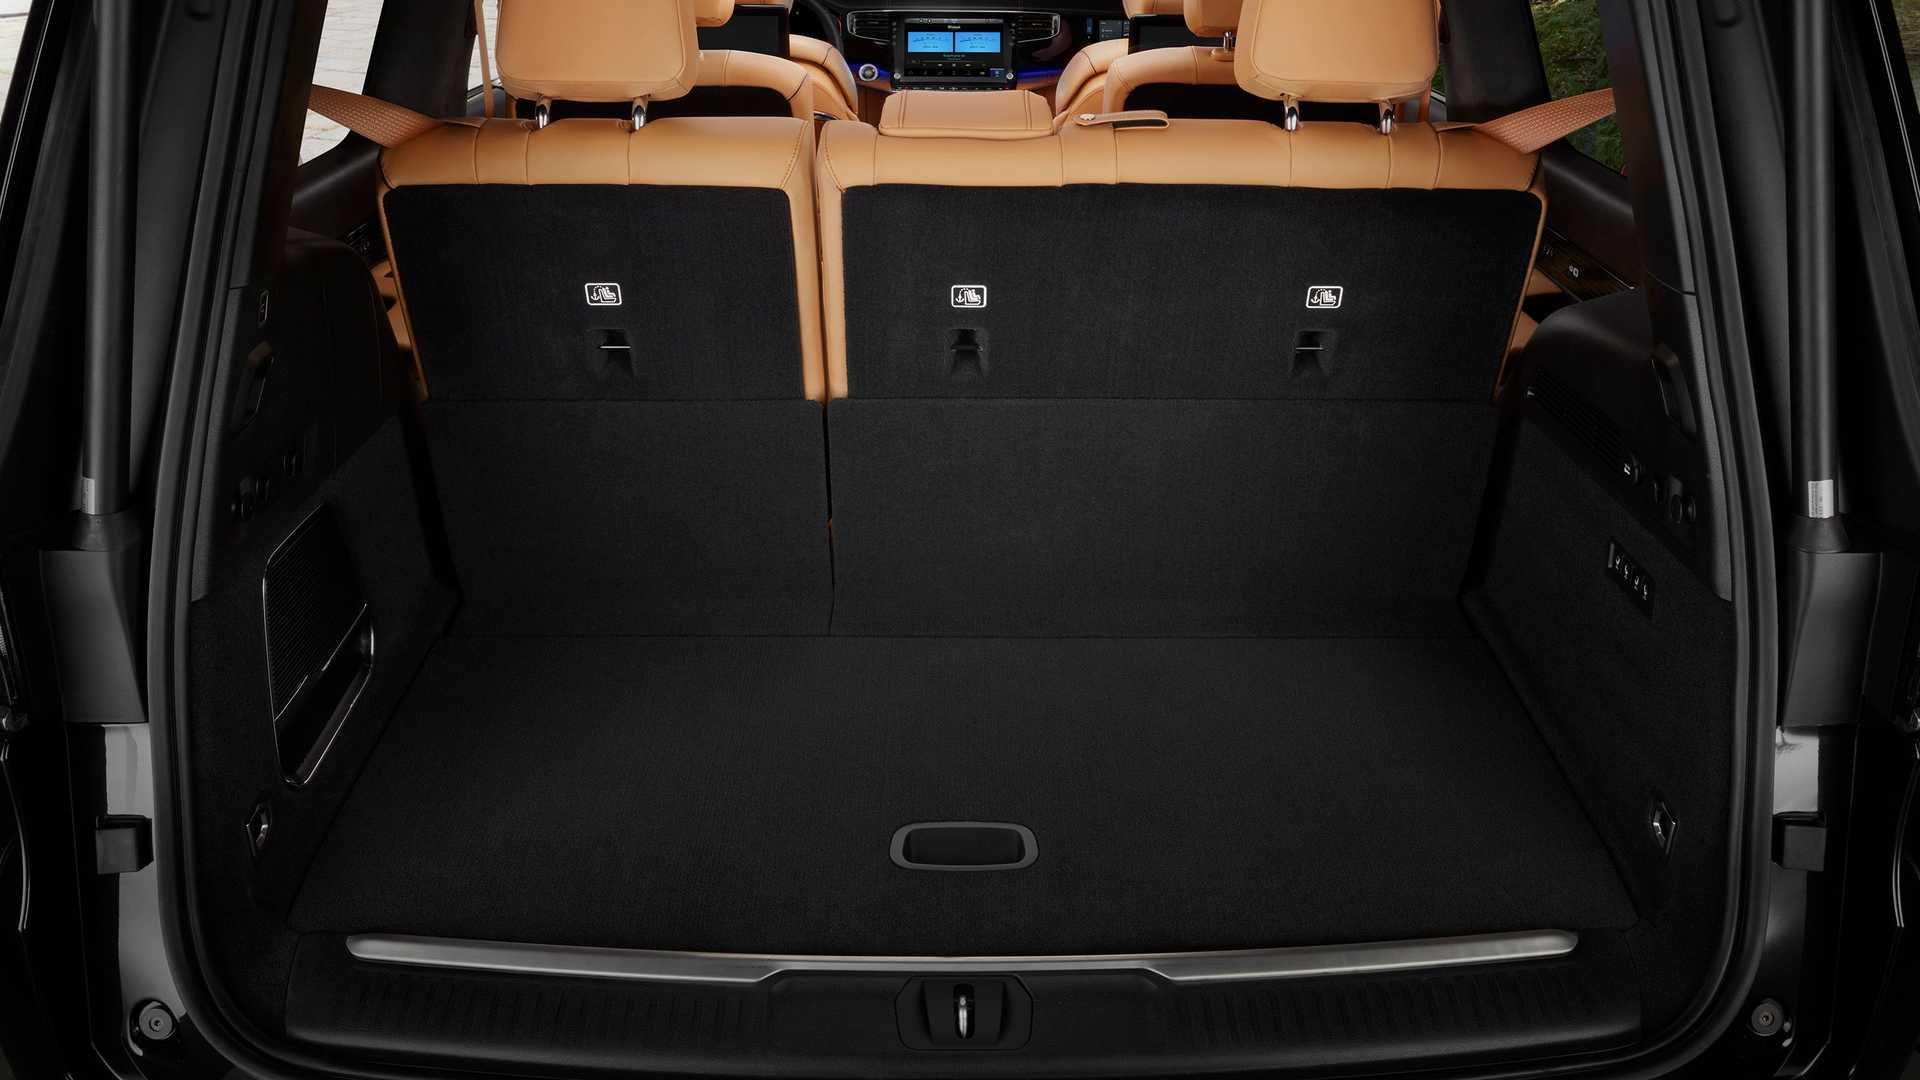 2022-jeep-grand-wagoneer-interior-cargo-space-1